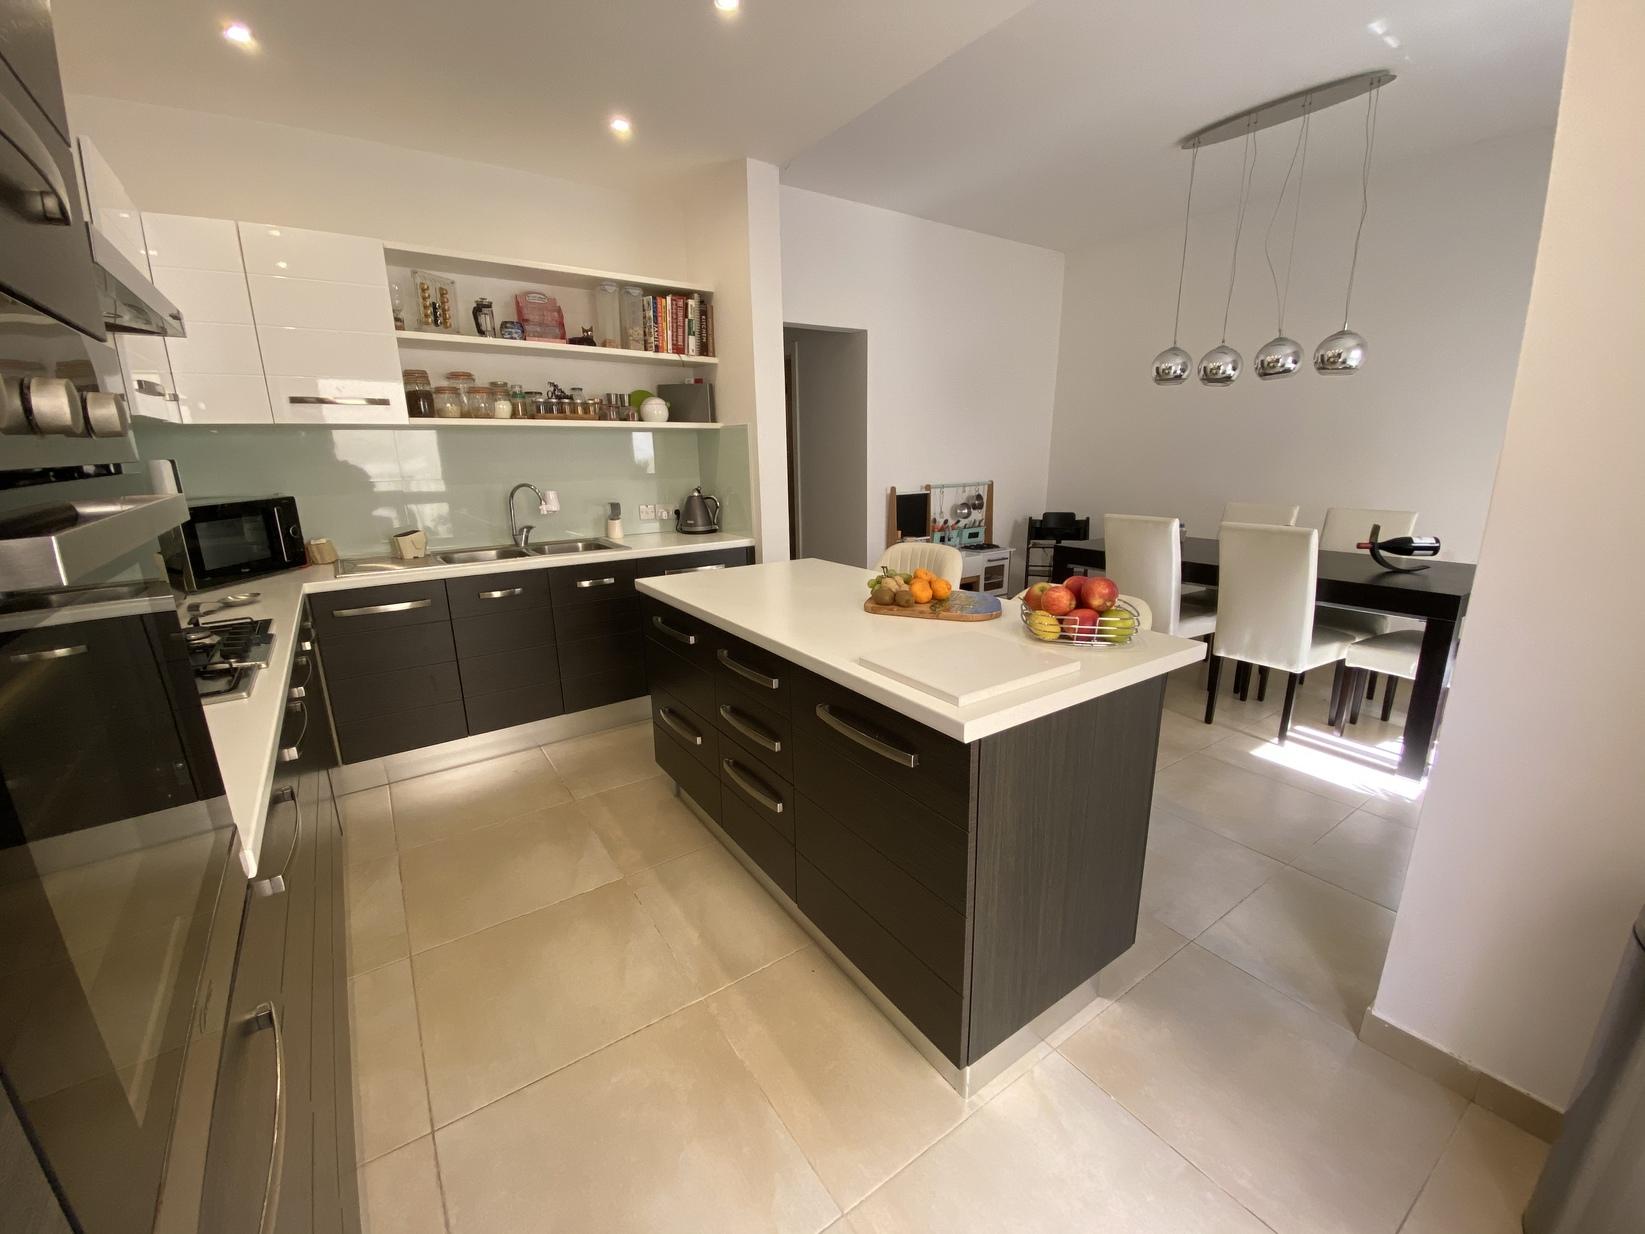 3 bed Terraced House For Sale in Balzan, Balzan - thumb 5